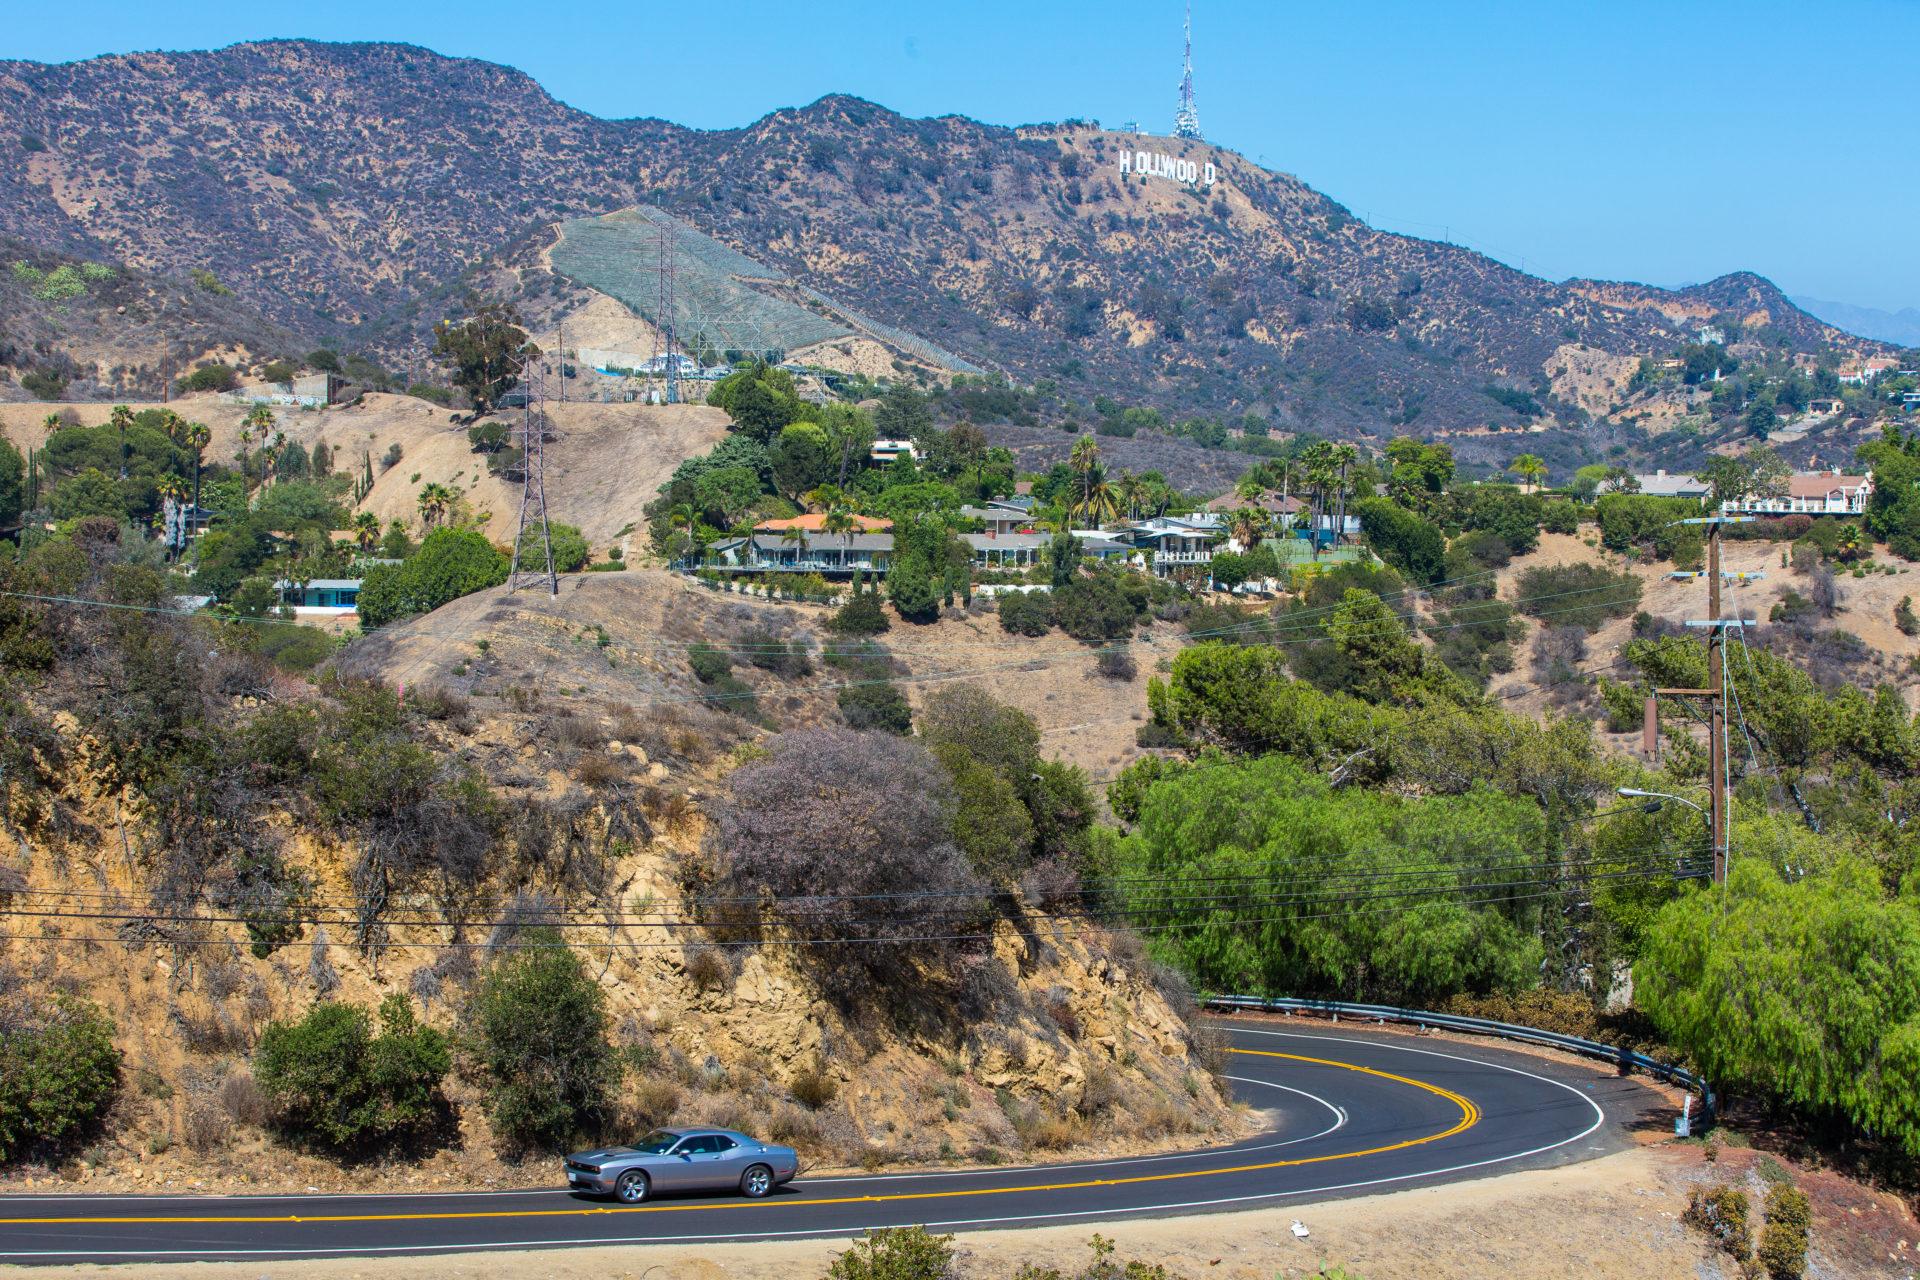 Hollywood Mulholland drive